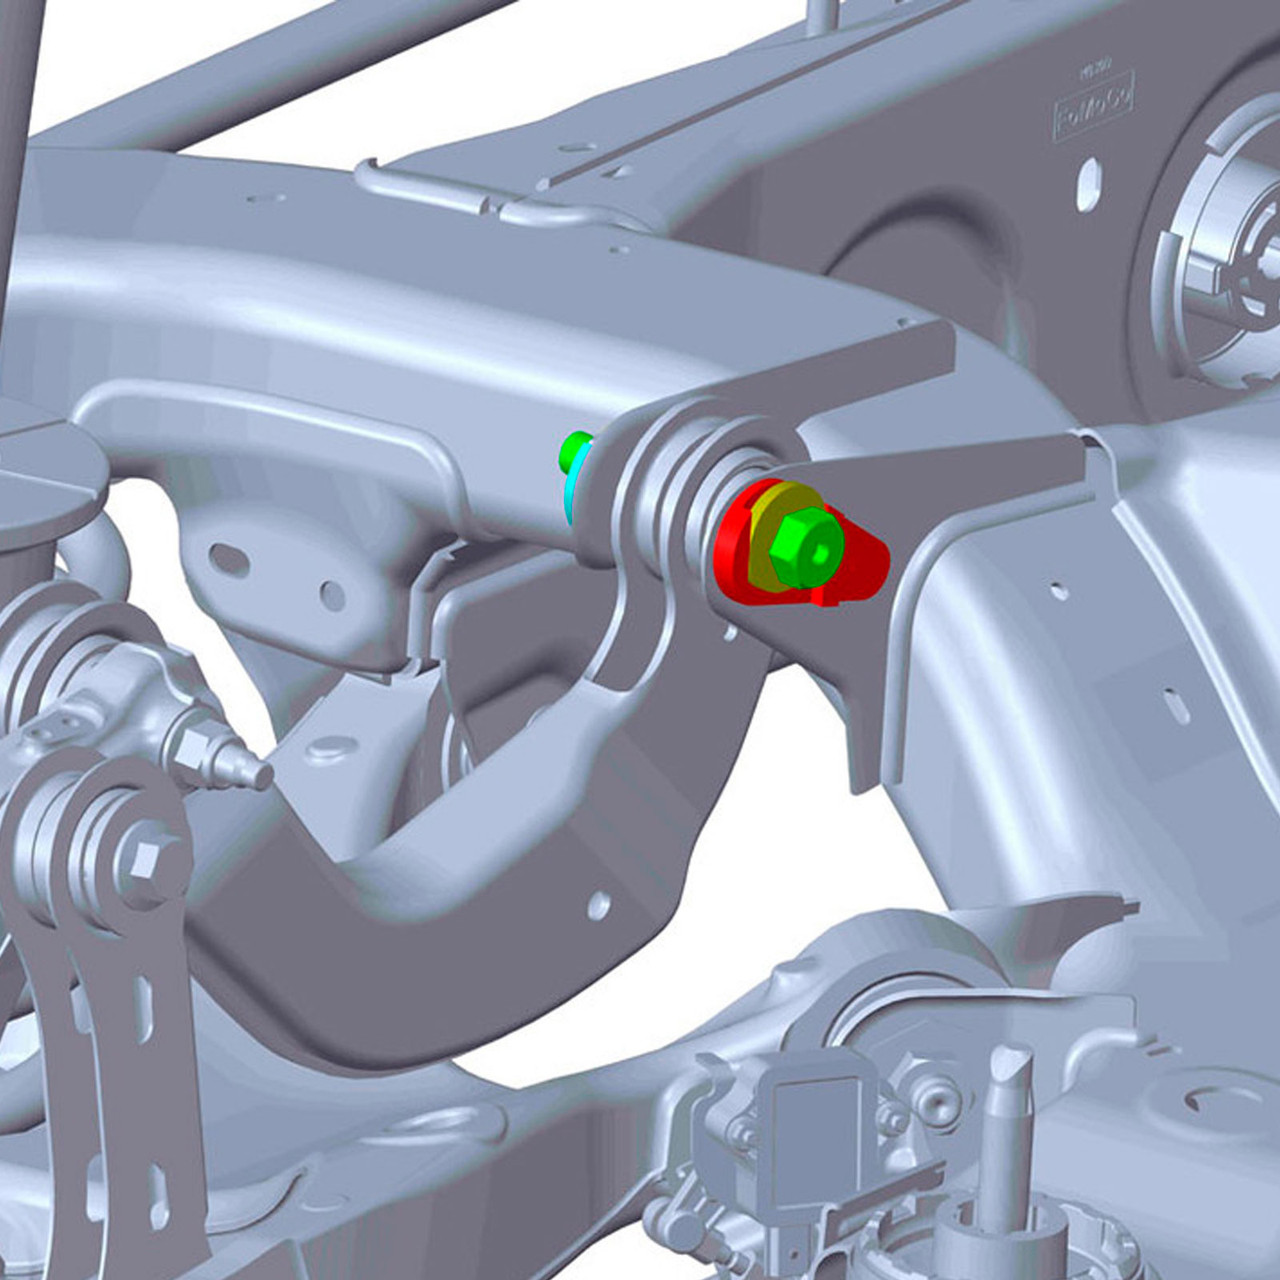 44-871 - 2020-2021 Ford Explorer SUV Rear Alignment Kit Illustration | McBay Performance